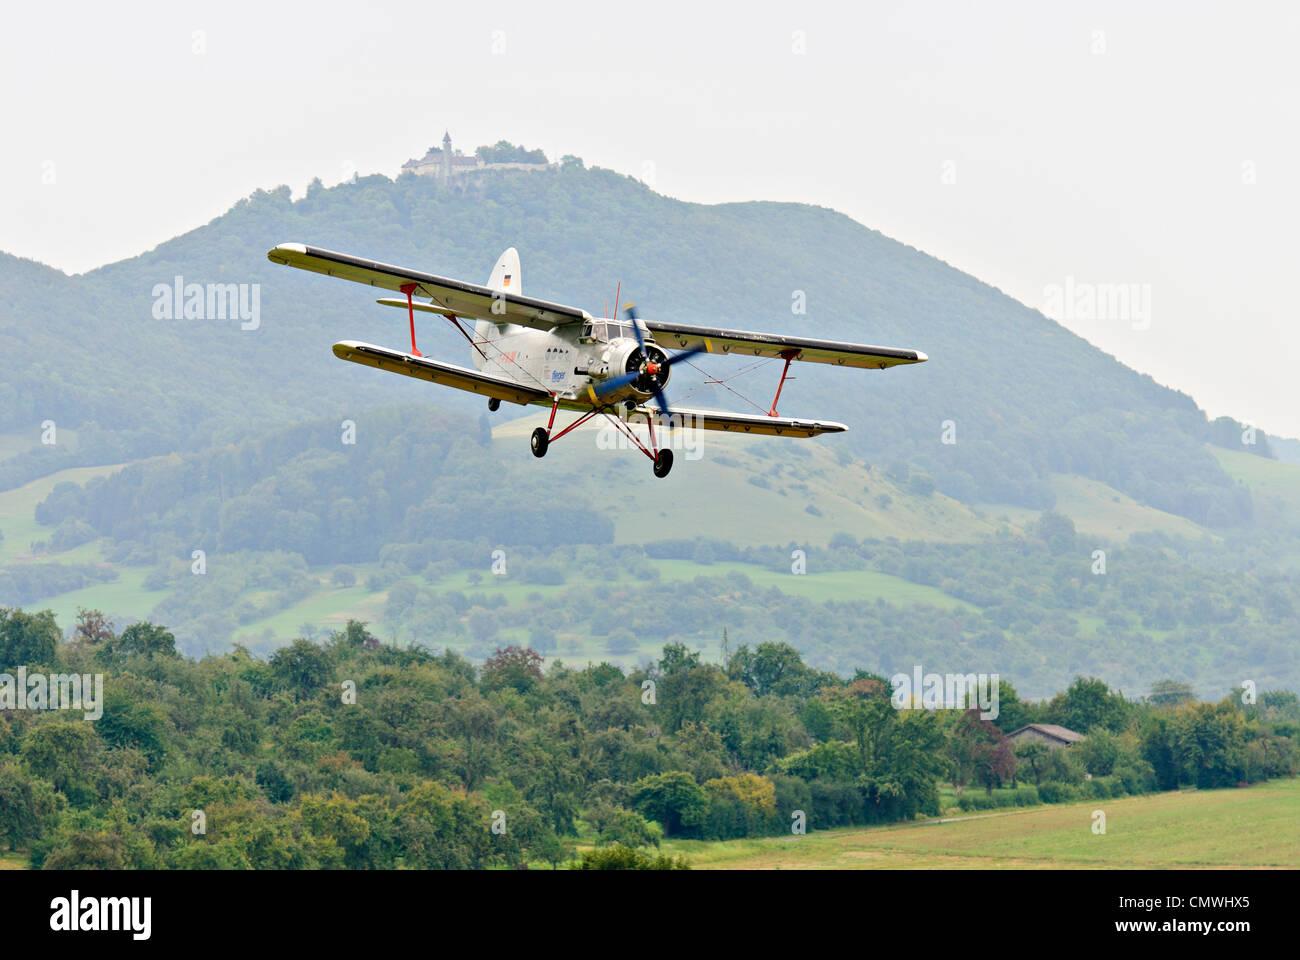 """1975"" Antonov An-2 landing approach at the Hahnweide vintage air show, Kirchheim-Teck, Germany - Stock Image"